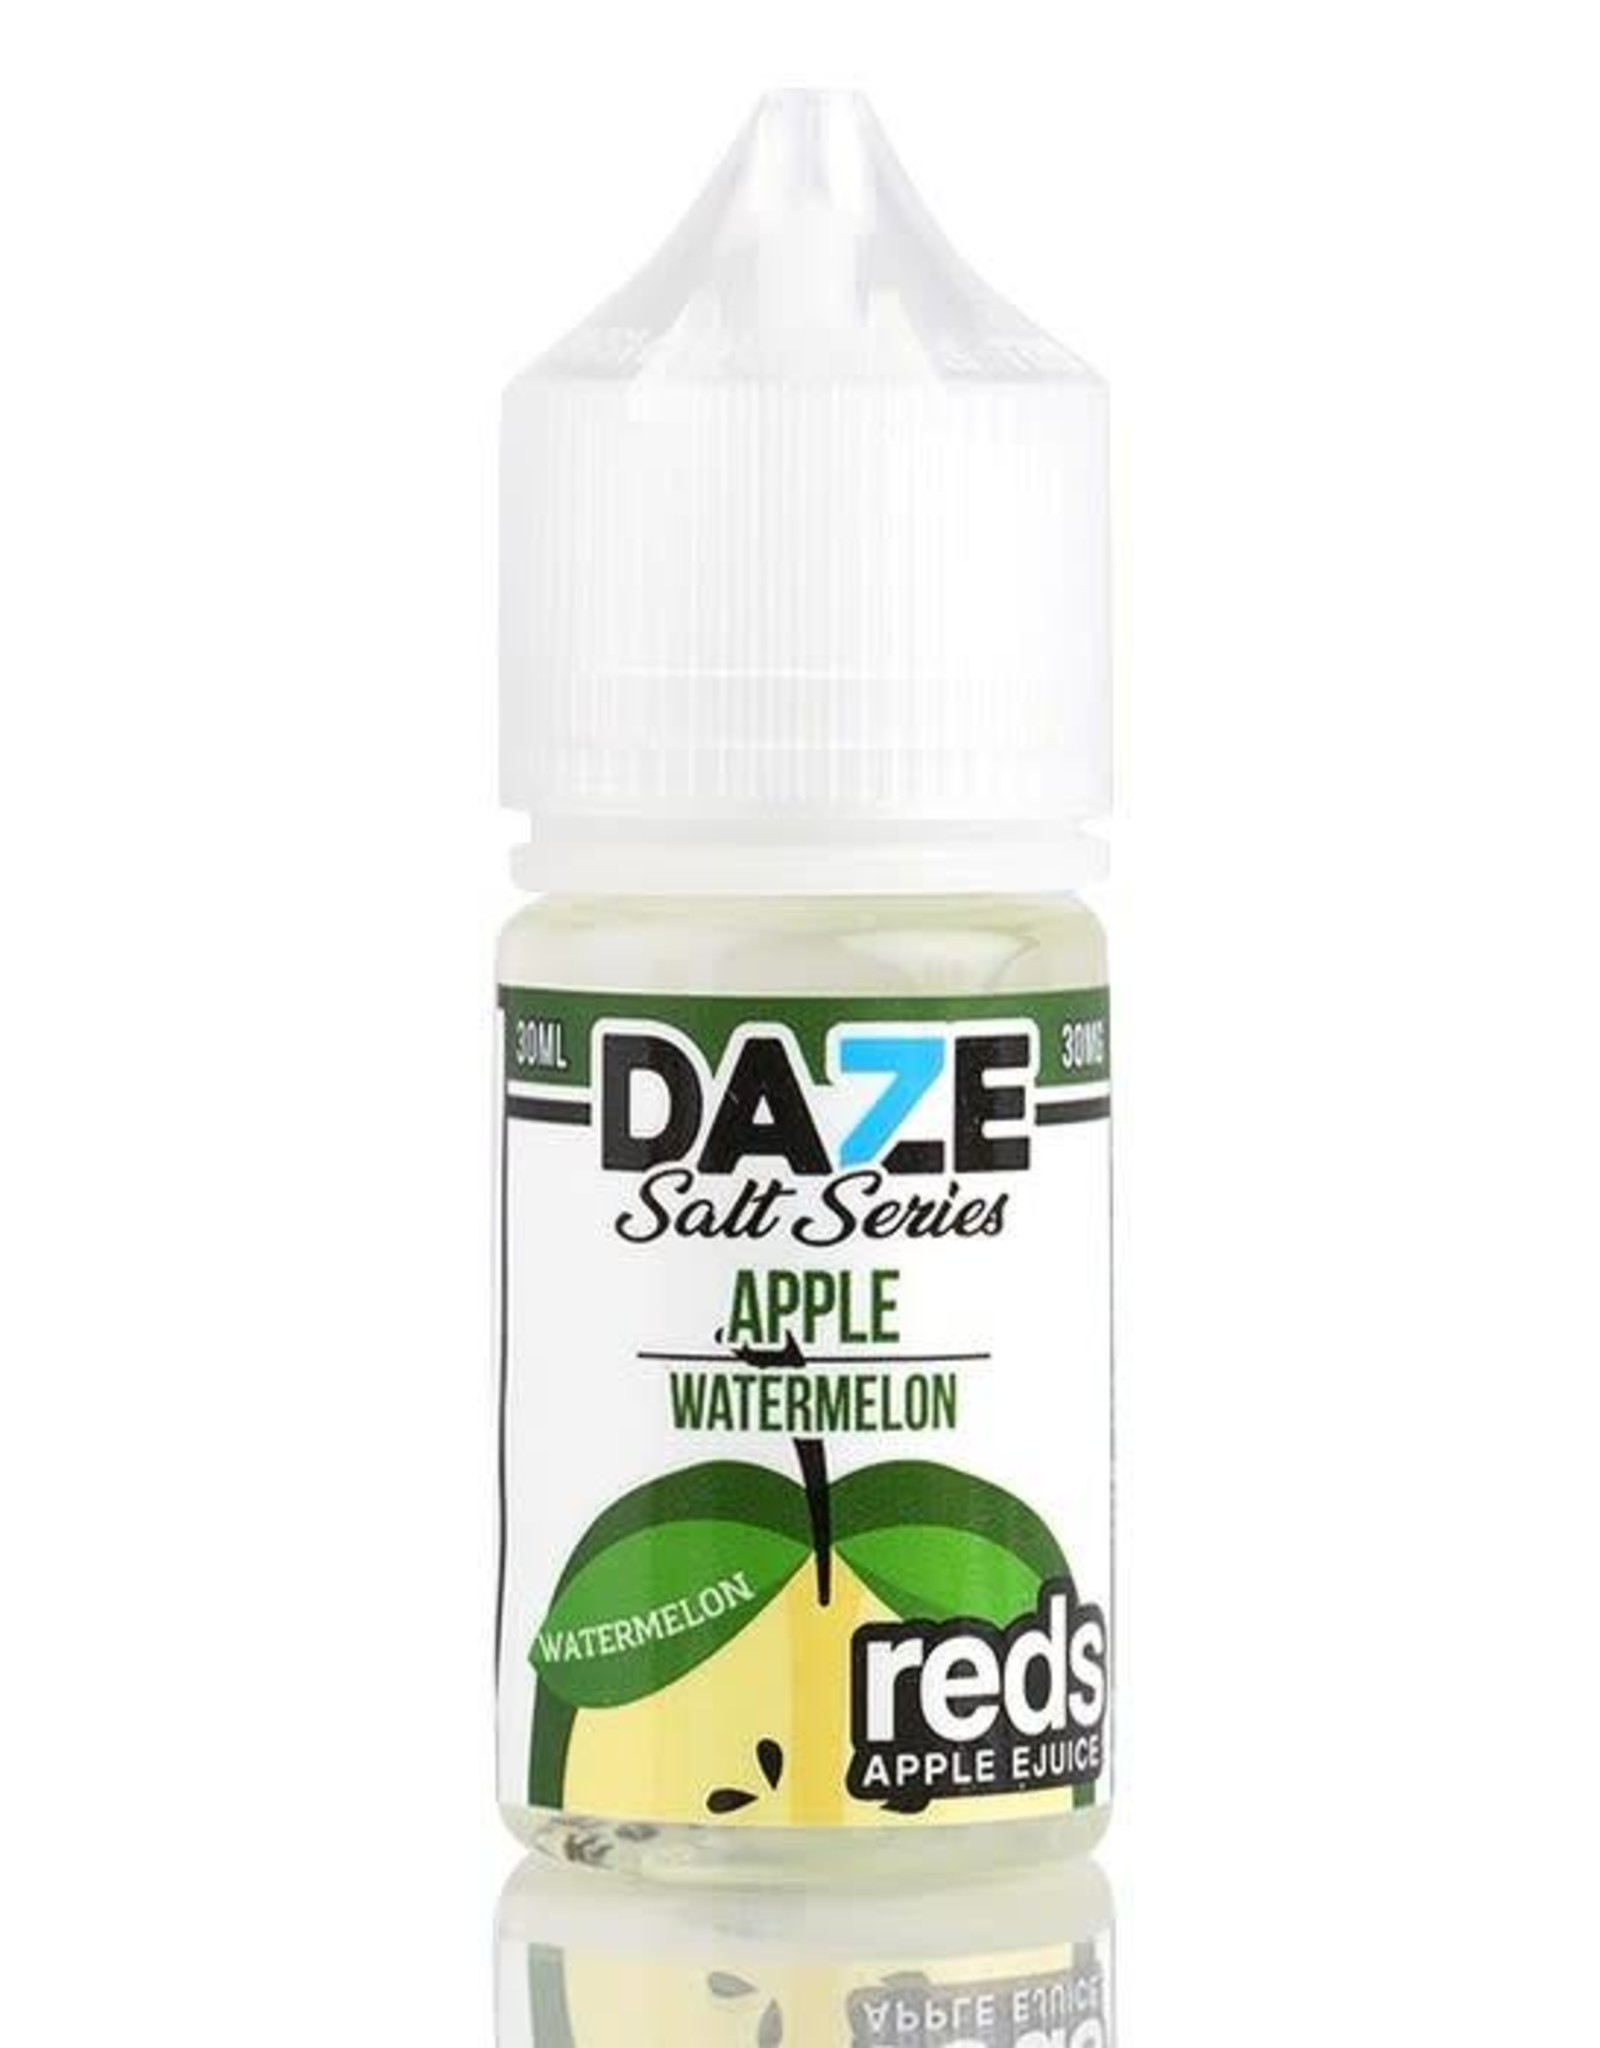 7 Daze - Salt Series Apple *Watermelon* (30mL)